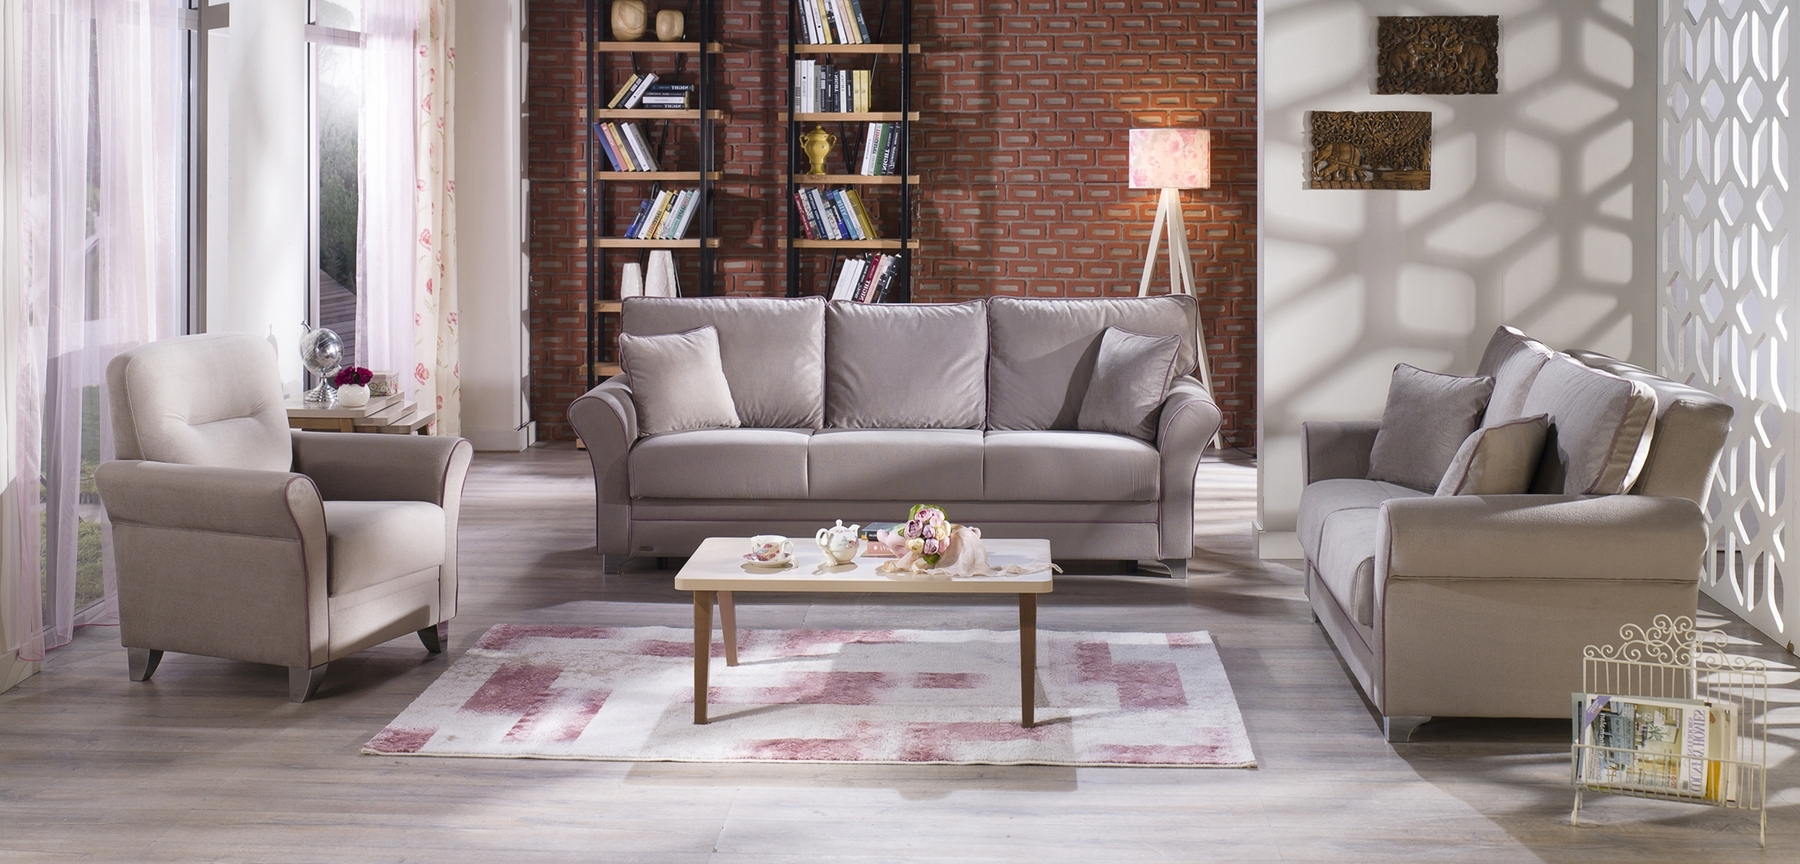 Well Liked Fabric Sofas Within Padova Paris Gray Sofa Padova Sunset Furniture Fabric Sofas At (View 10 of 15)